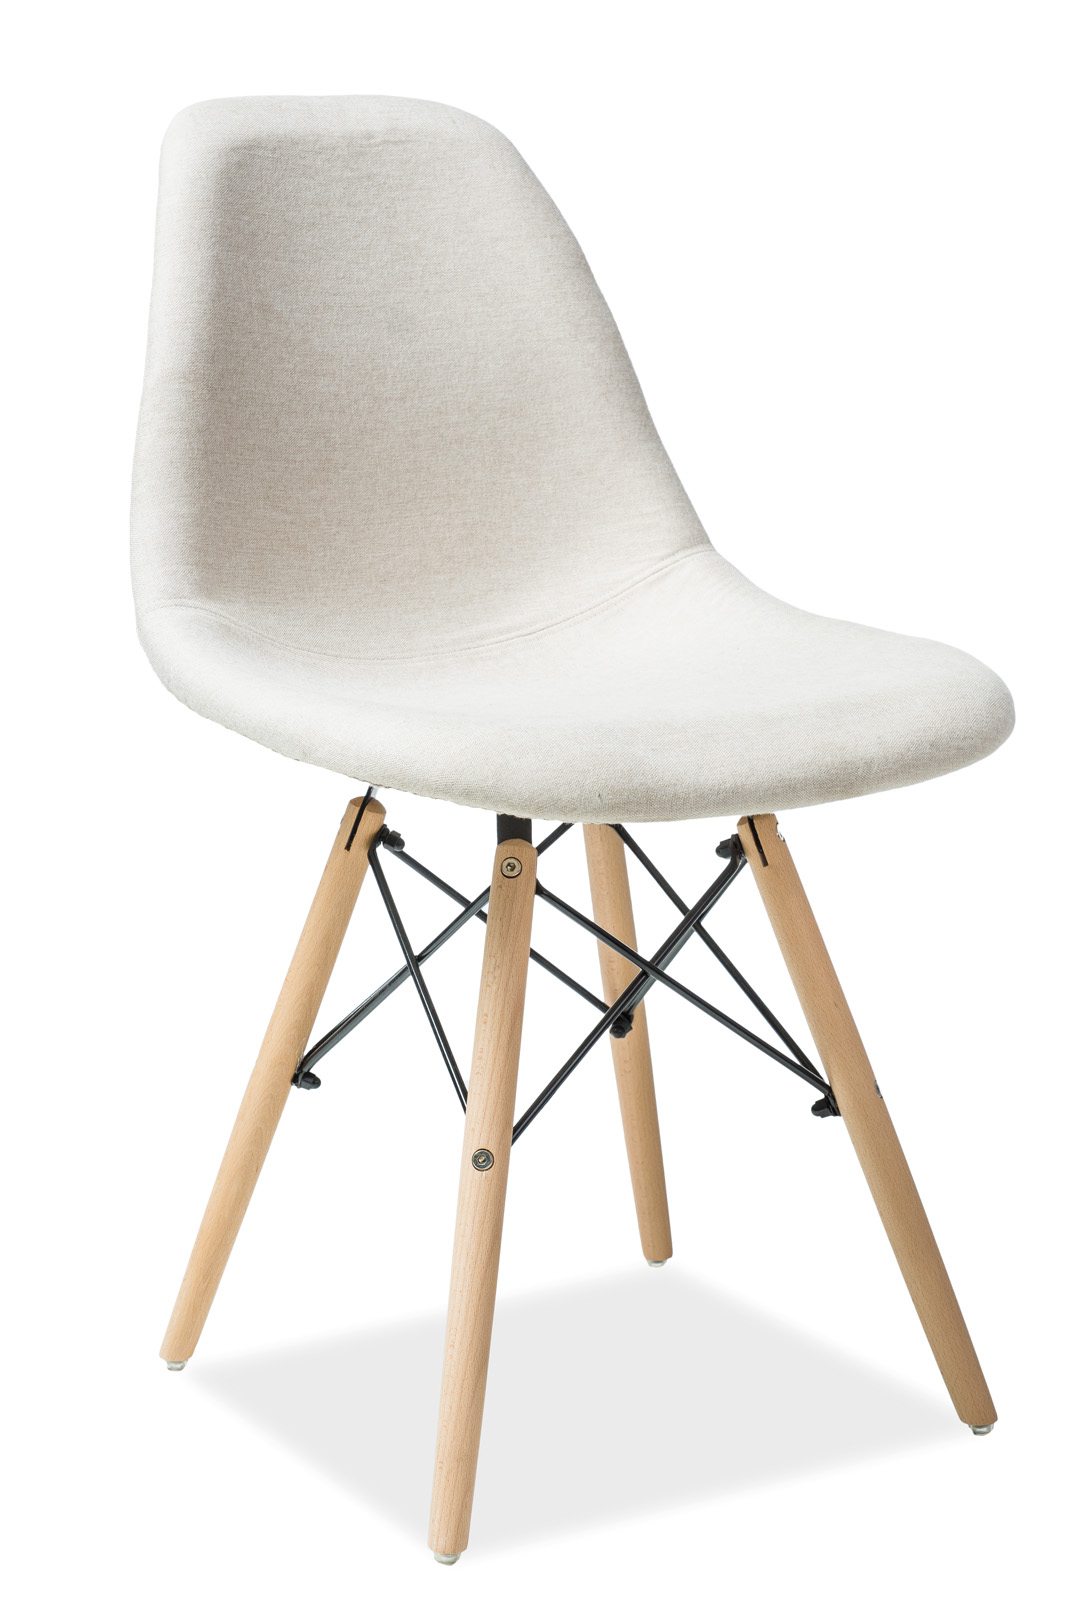 Scaun tapitat cu stofa, cu picioare din lemn Coco Beige, l46xA40xH84 cm somproduct.ro